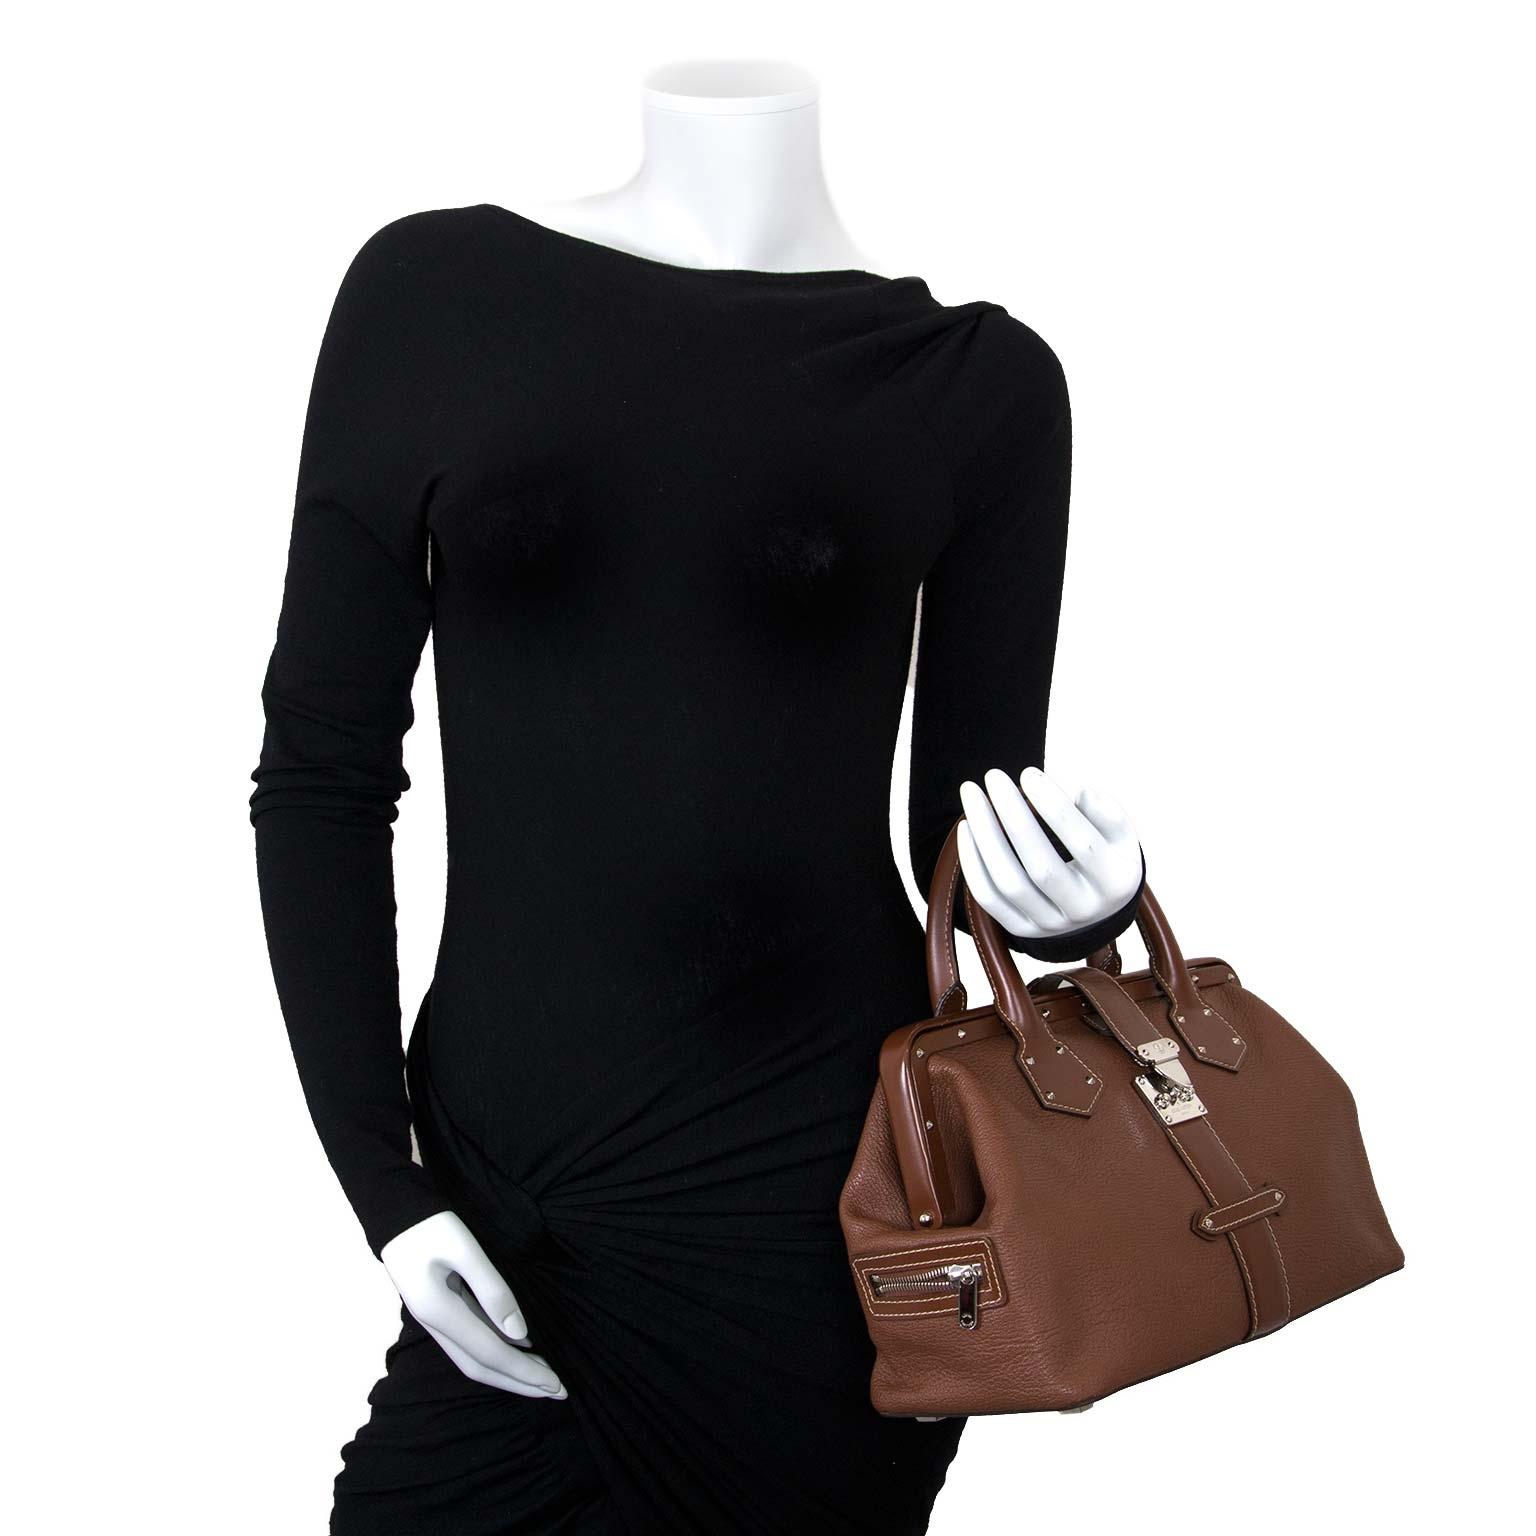 louis vuitton brown suhali l'ingenieux doctor bag now for sale at labellov vintage fashion webshop belgium